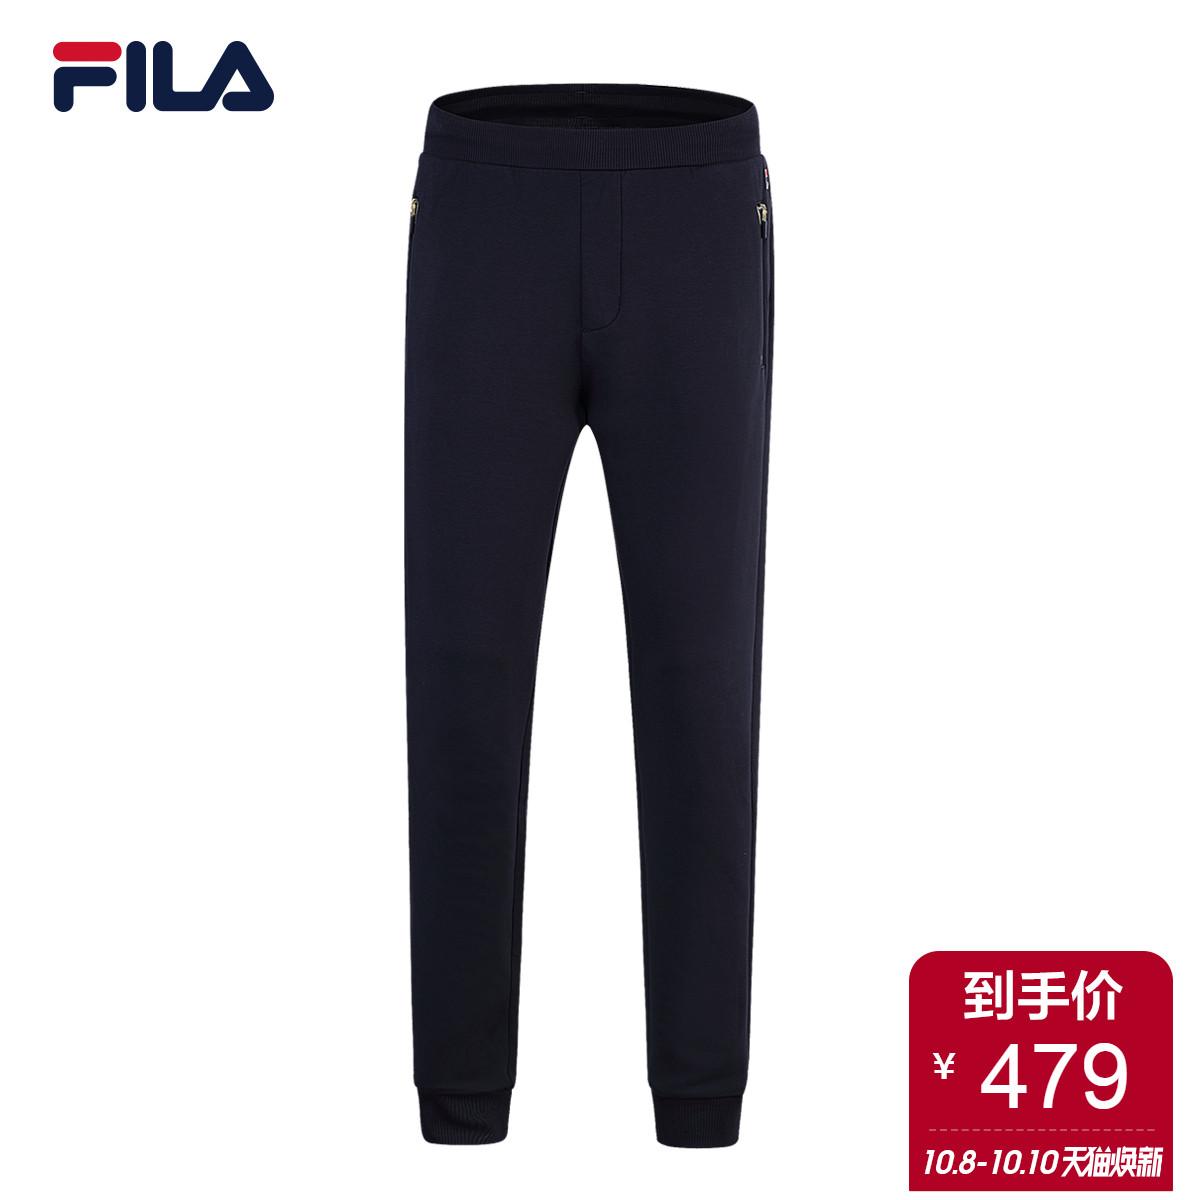 FILA斐乐男士长裤2018秋季新品收口长裤休闲透气跑步运动裤男